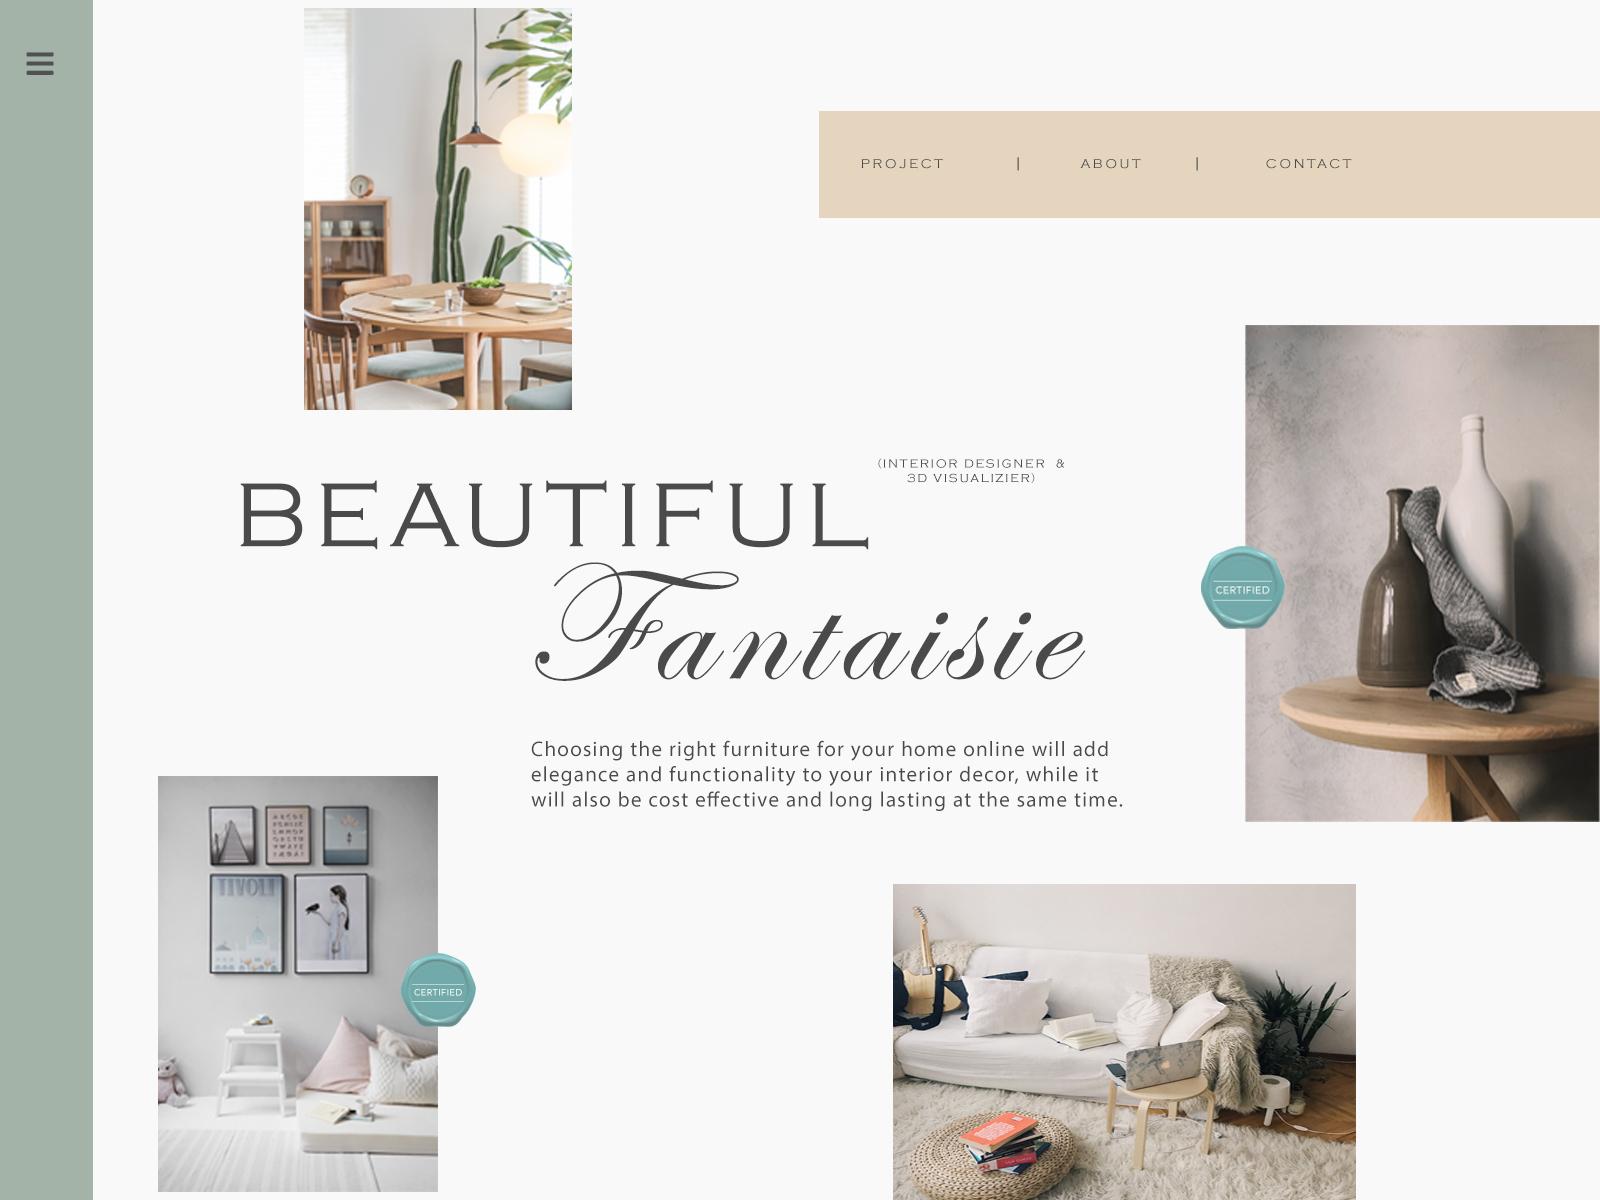 Online Home Decor Store by Neer Kumar on Dribbble